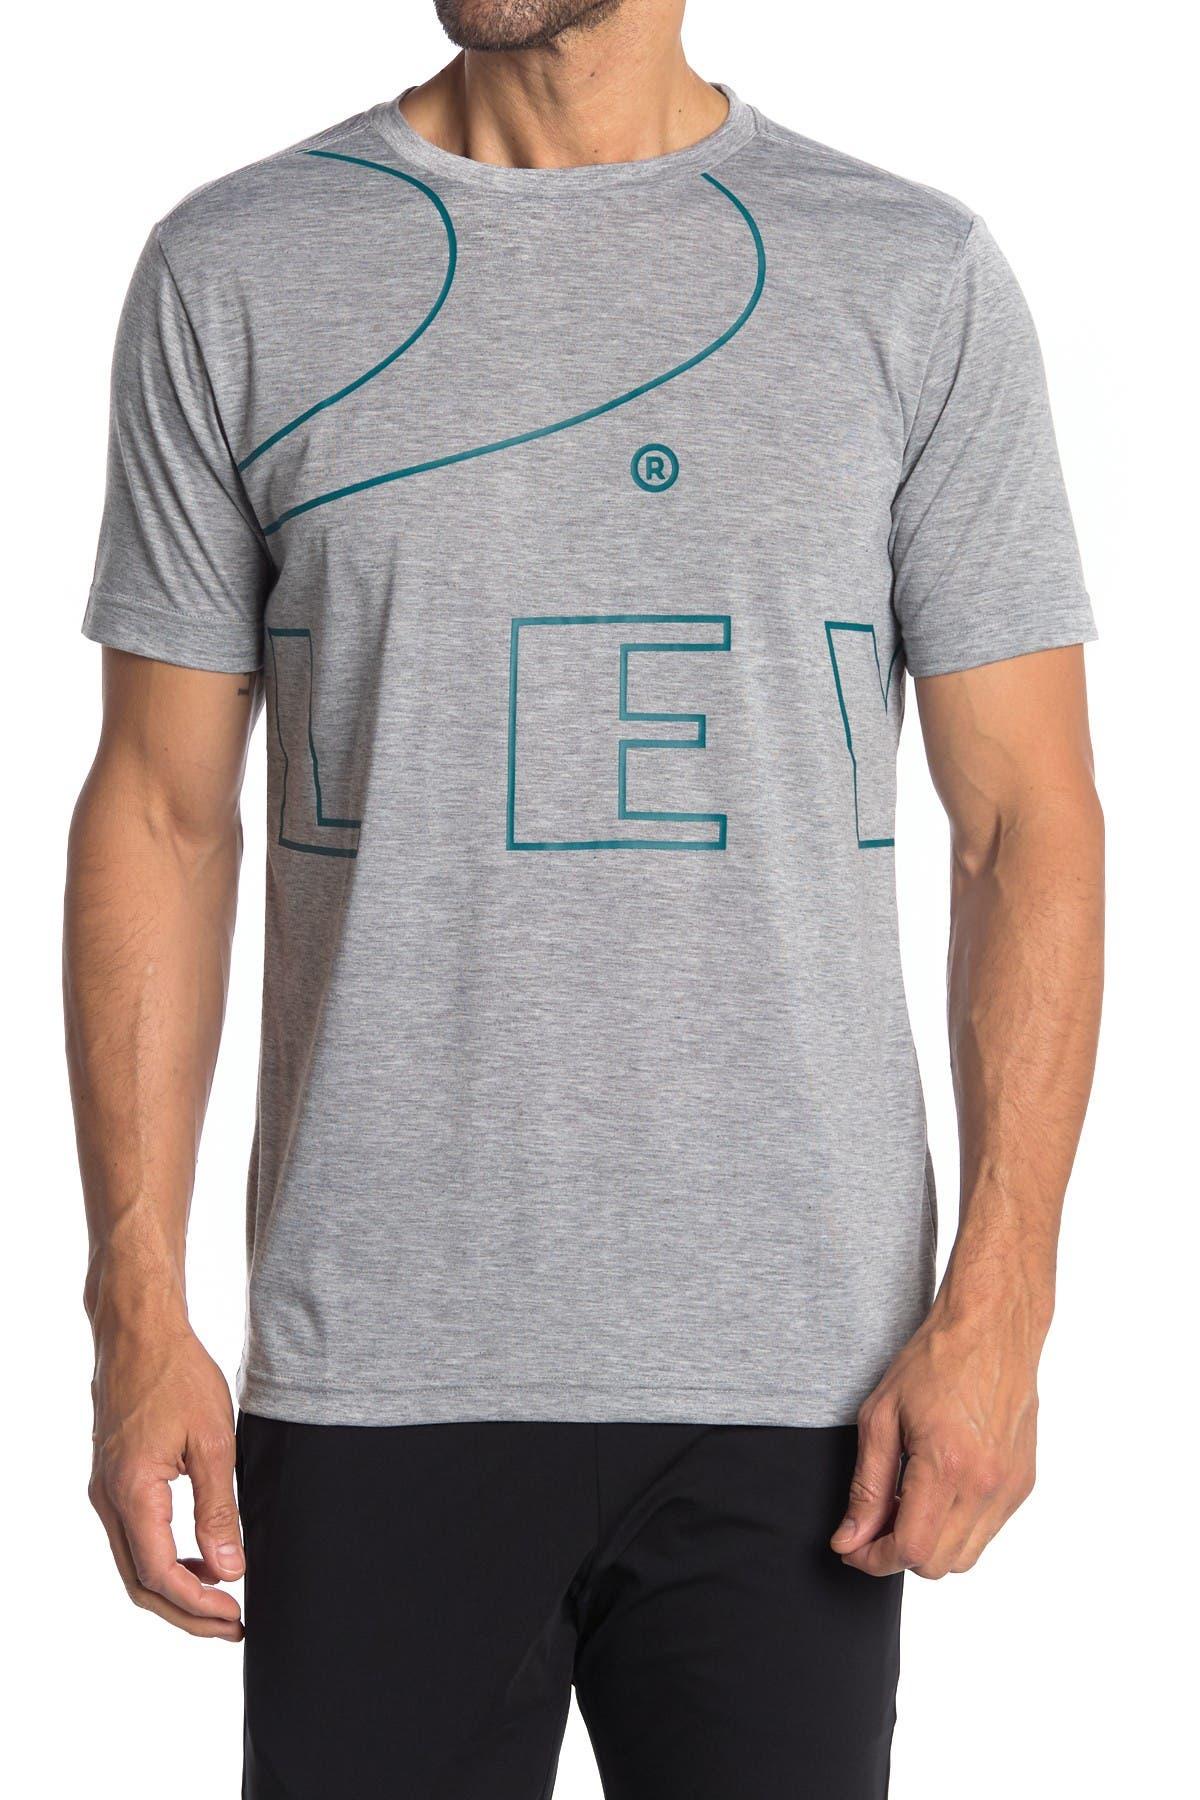 Image of Oakley Enhance Technical QD T-Shirt